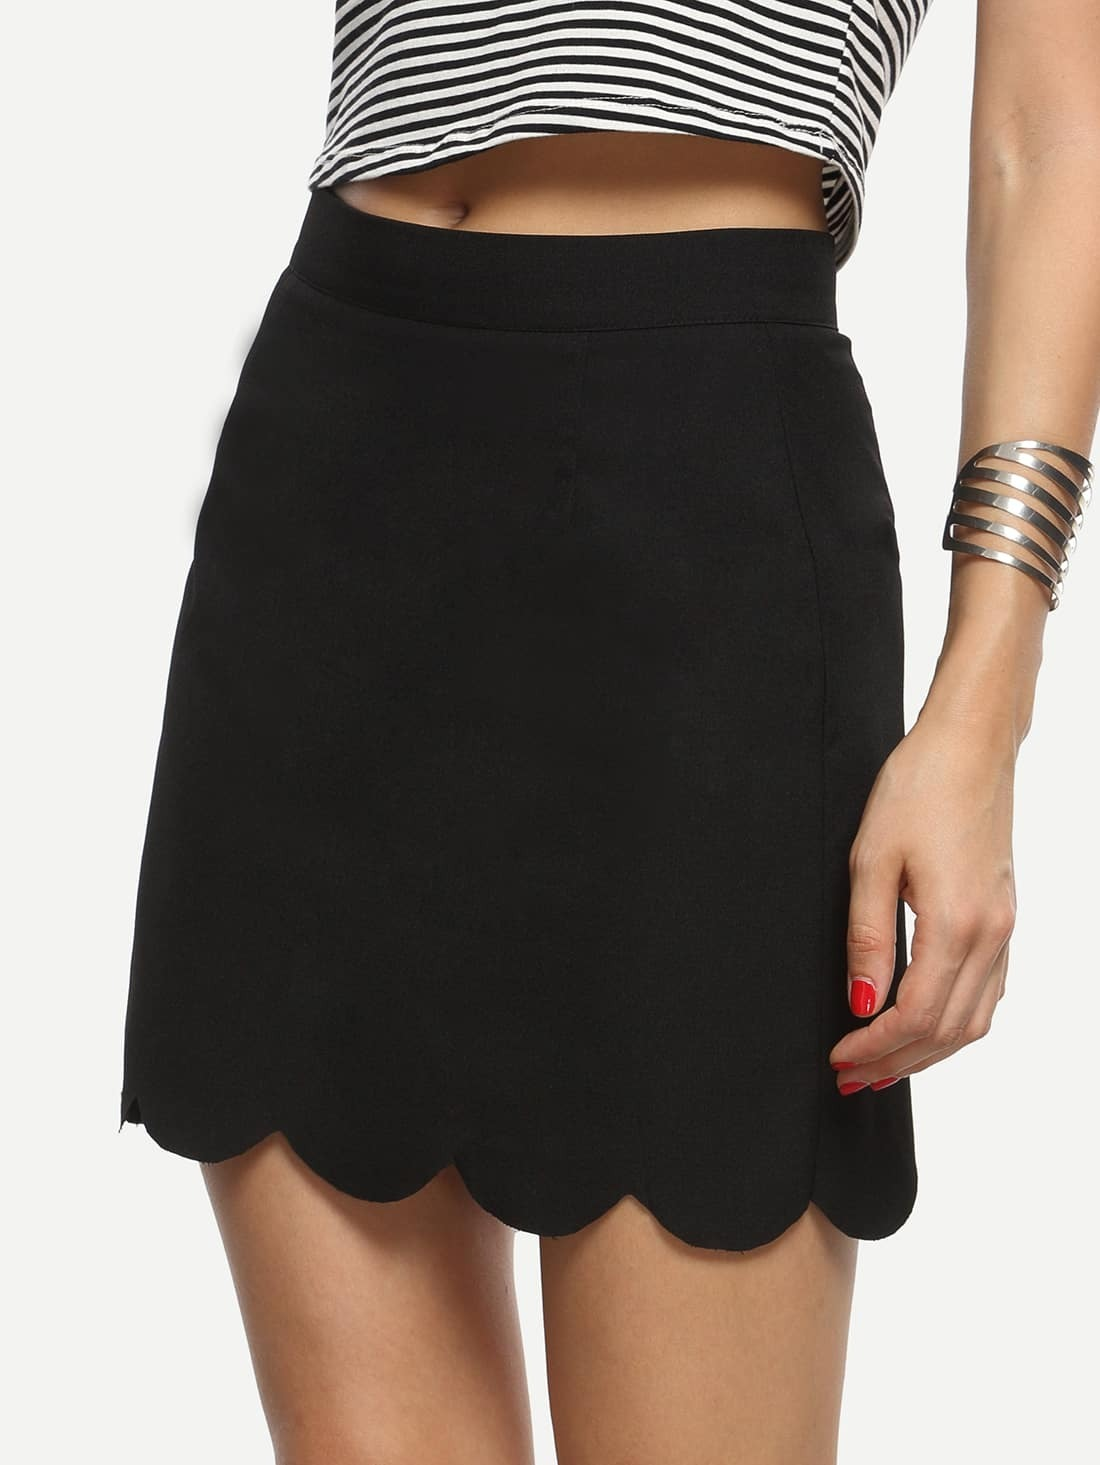 5e296ec74 Black Scalloped Hem A-line Skirt EmmaCloth-Women Fast Fashion Online